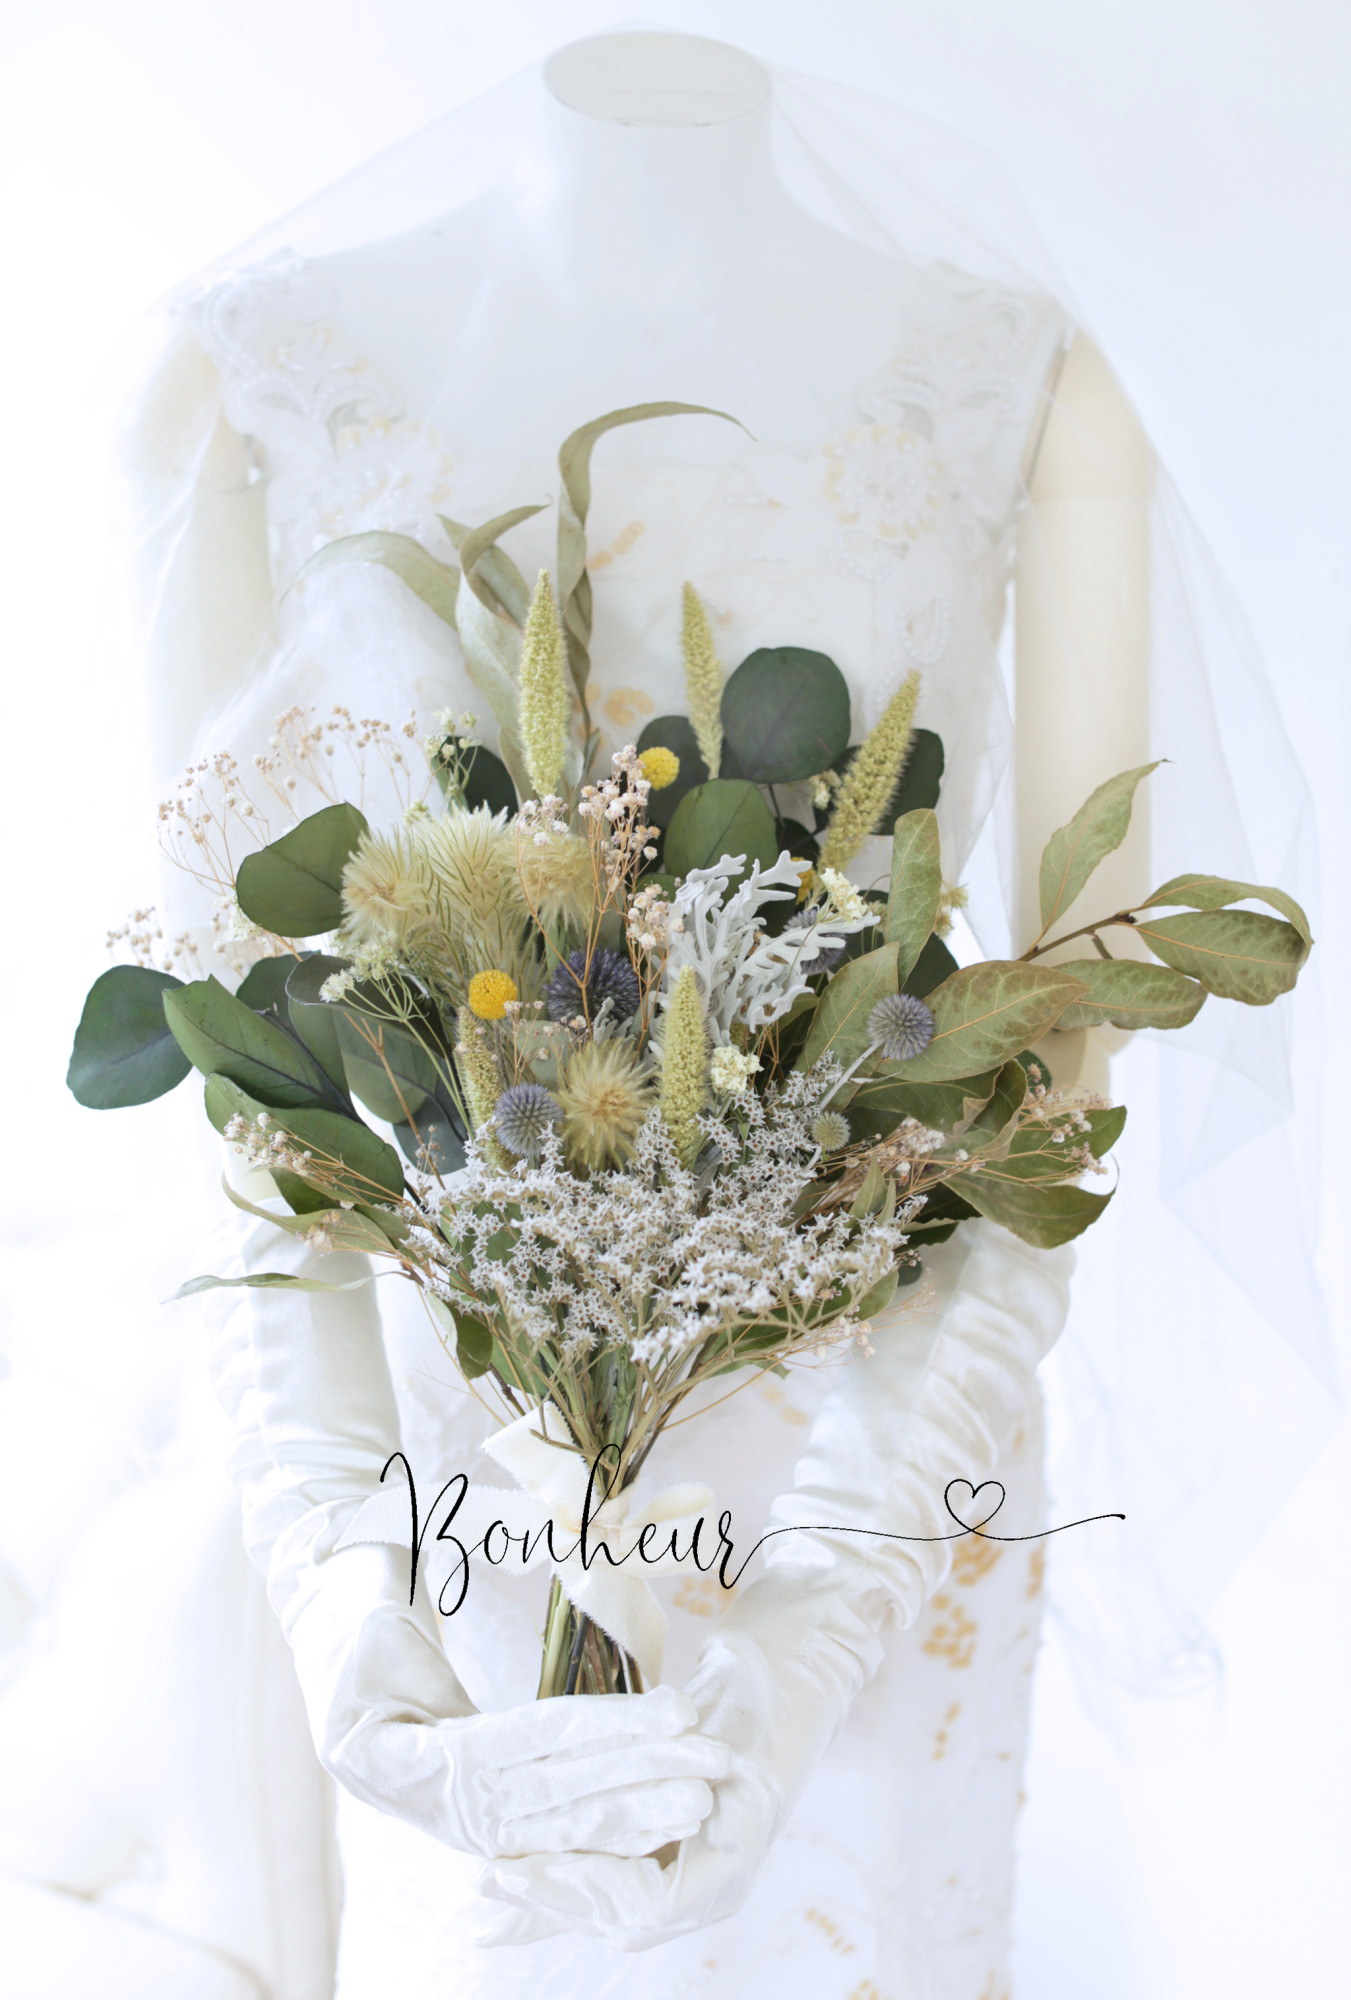 b_bouquet20180913_2